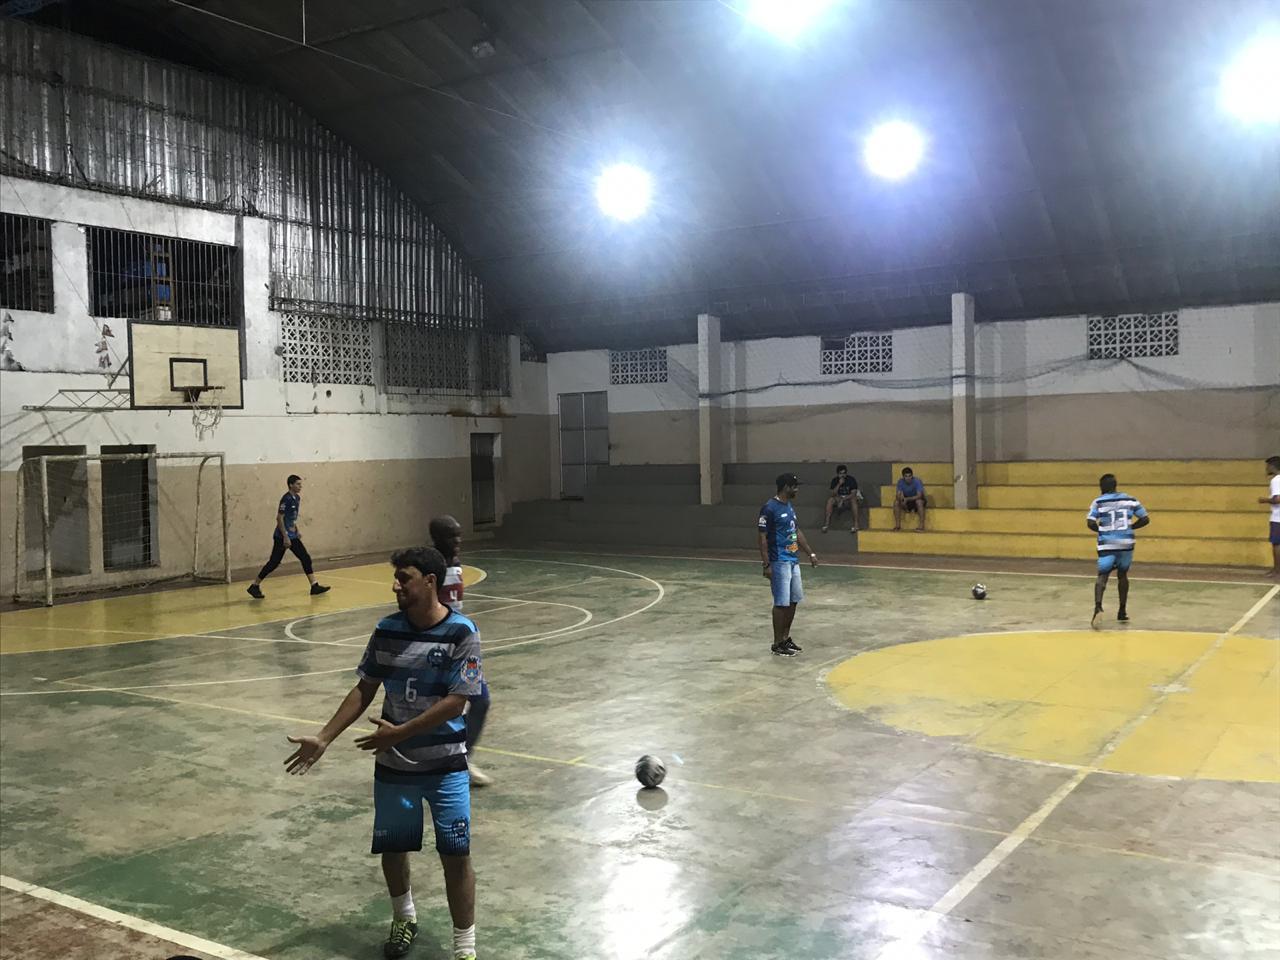 Laje Futsal vence Itaperuna em amistoso em Laje do Muriaé  5efc8a2131e66